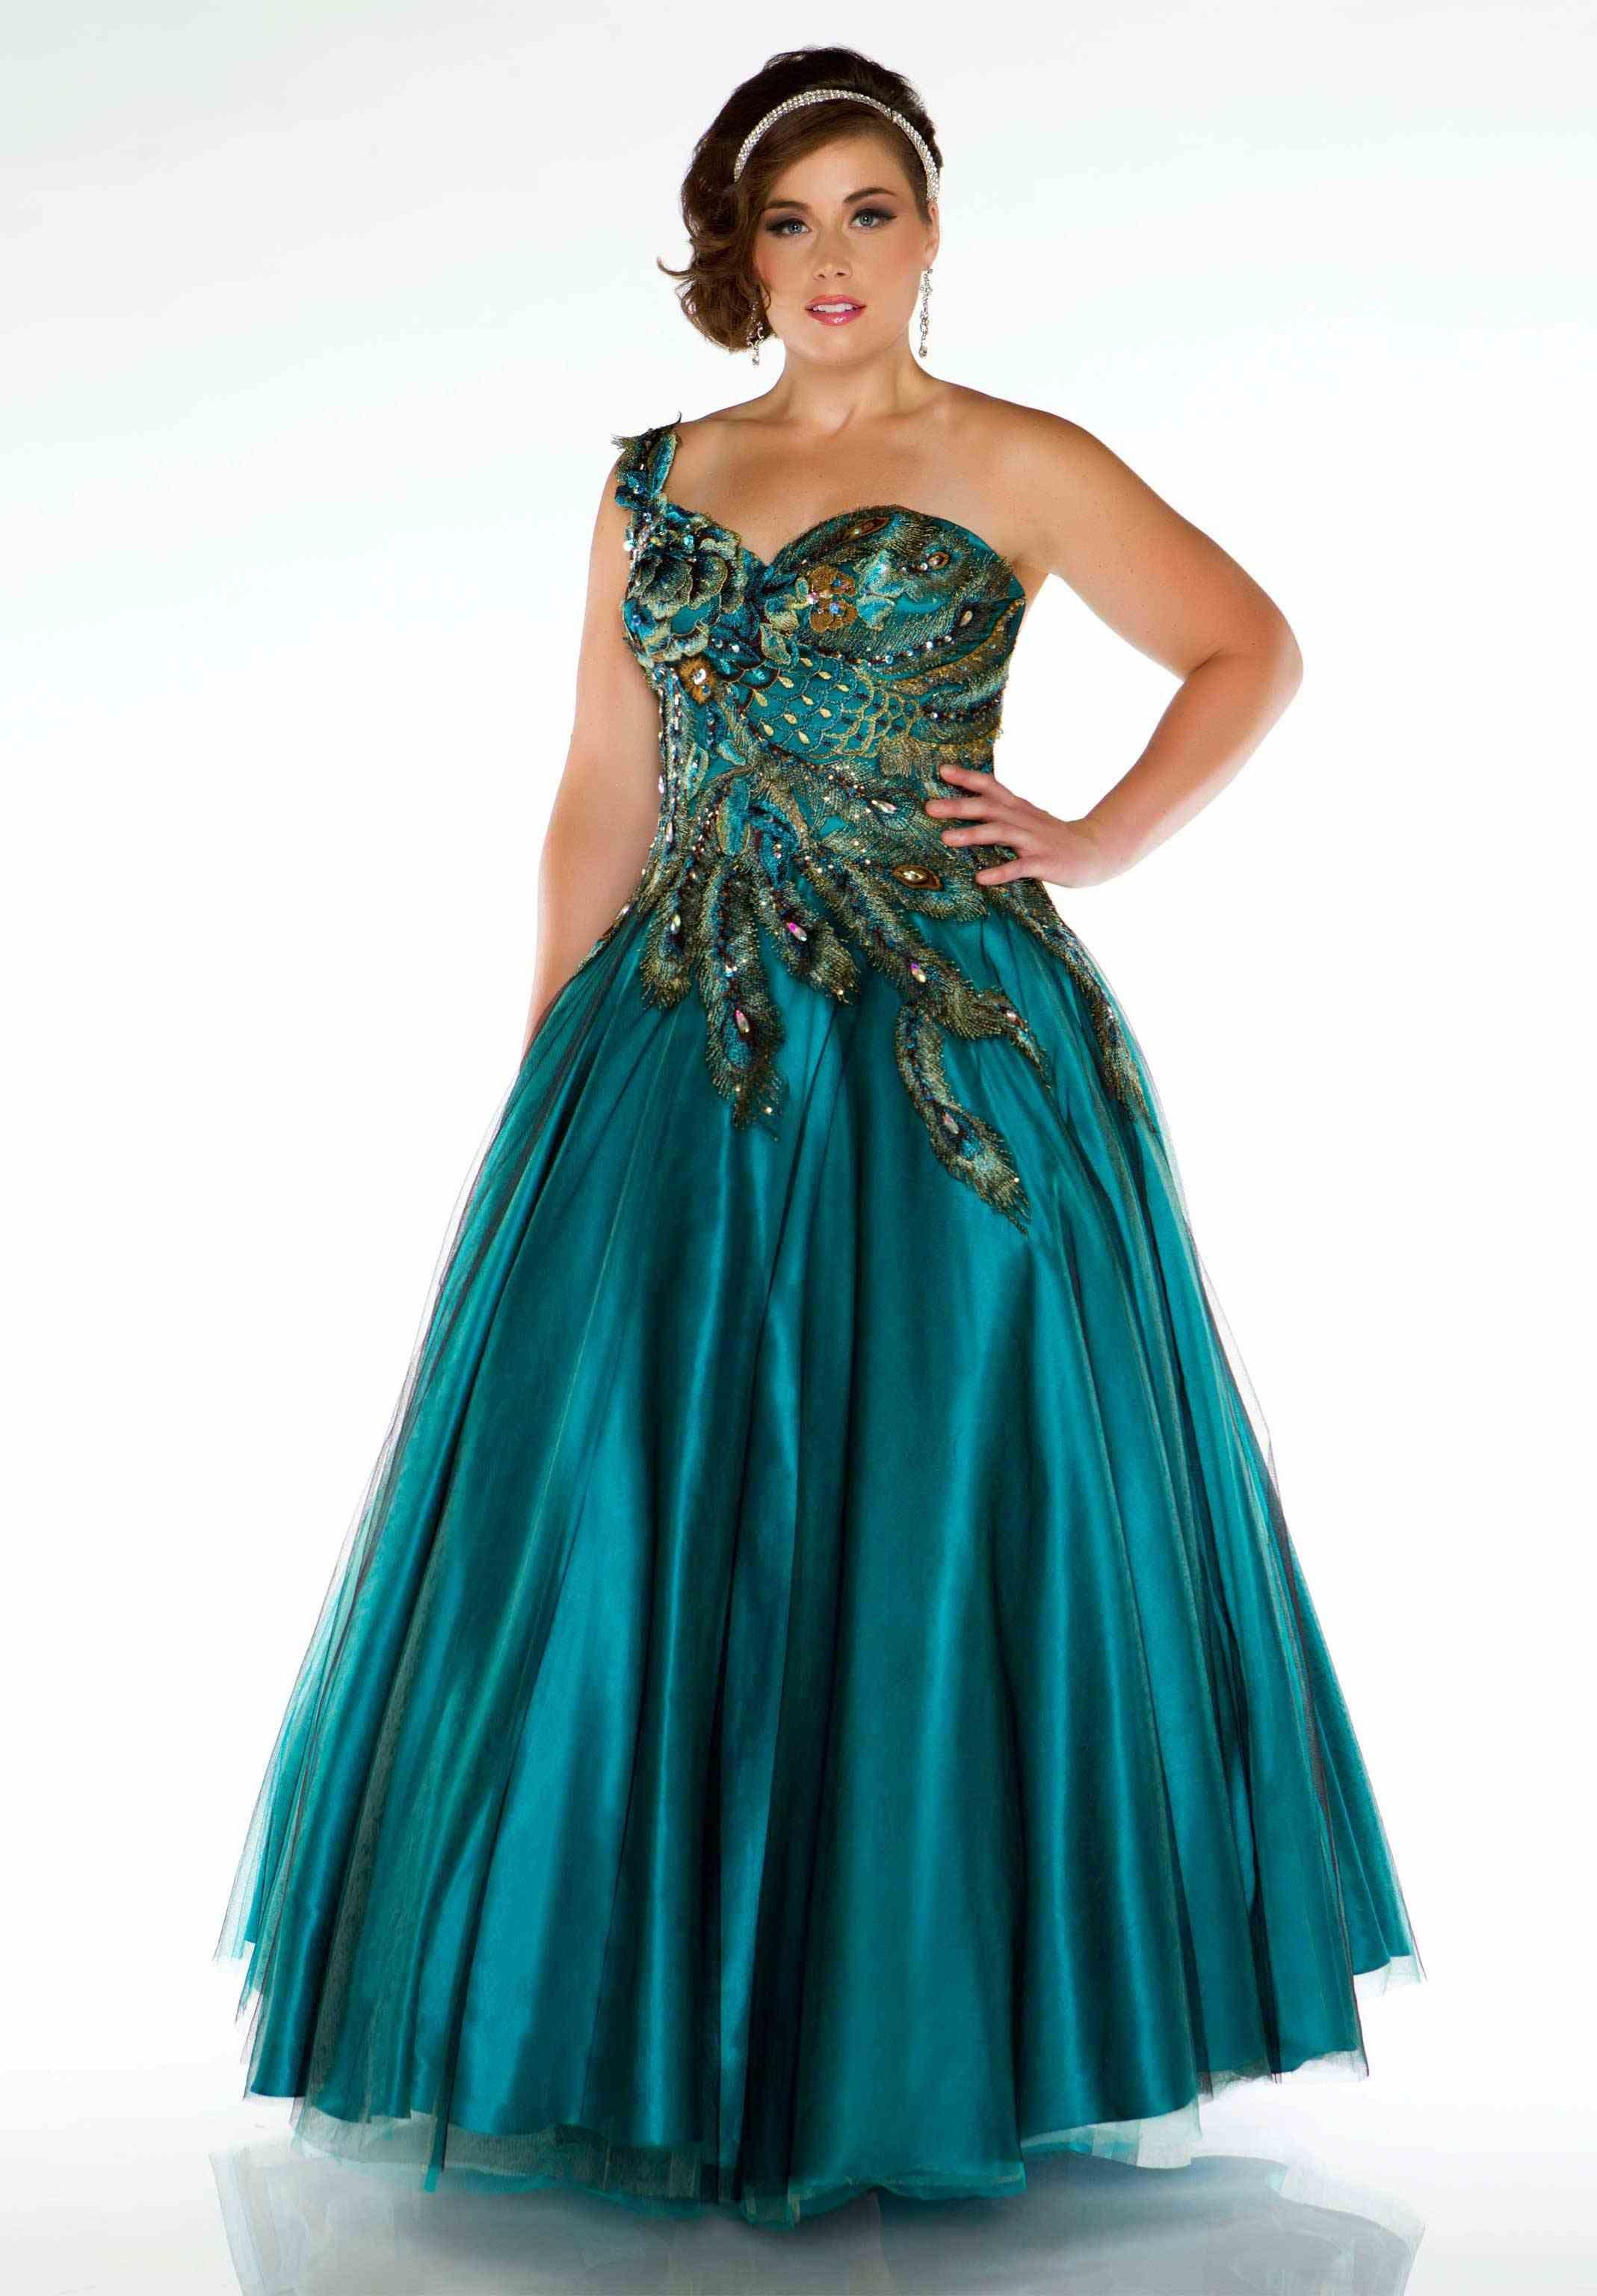 Mac duggal f buy designer mac duggal one shoulder dress dress